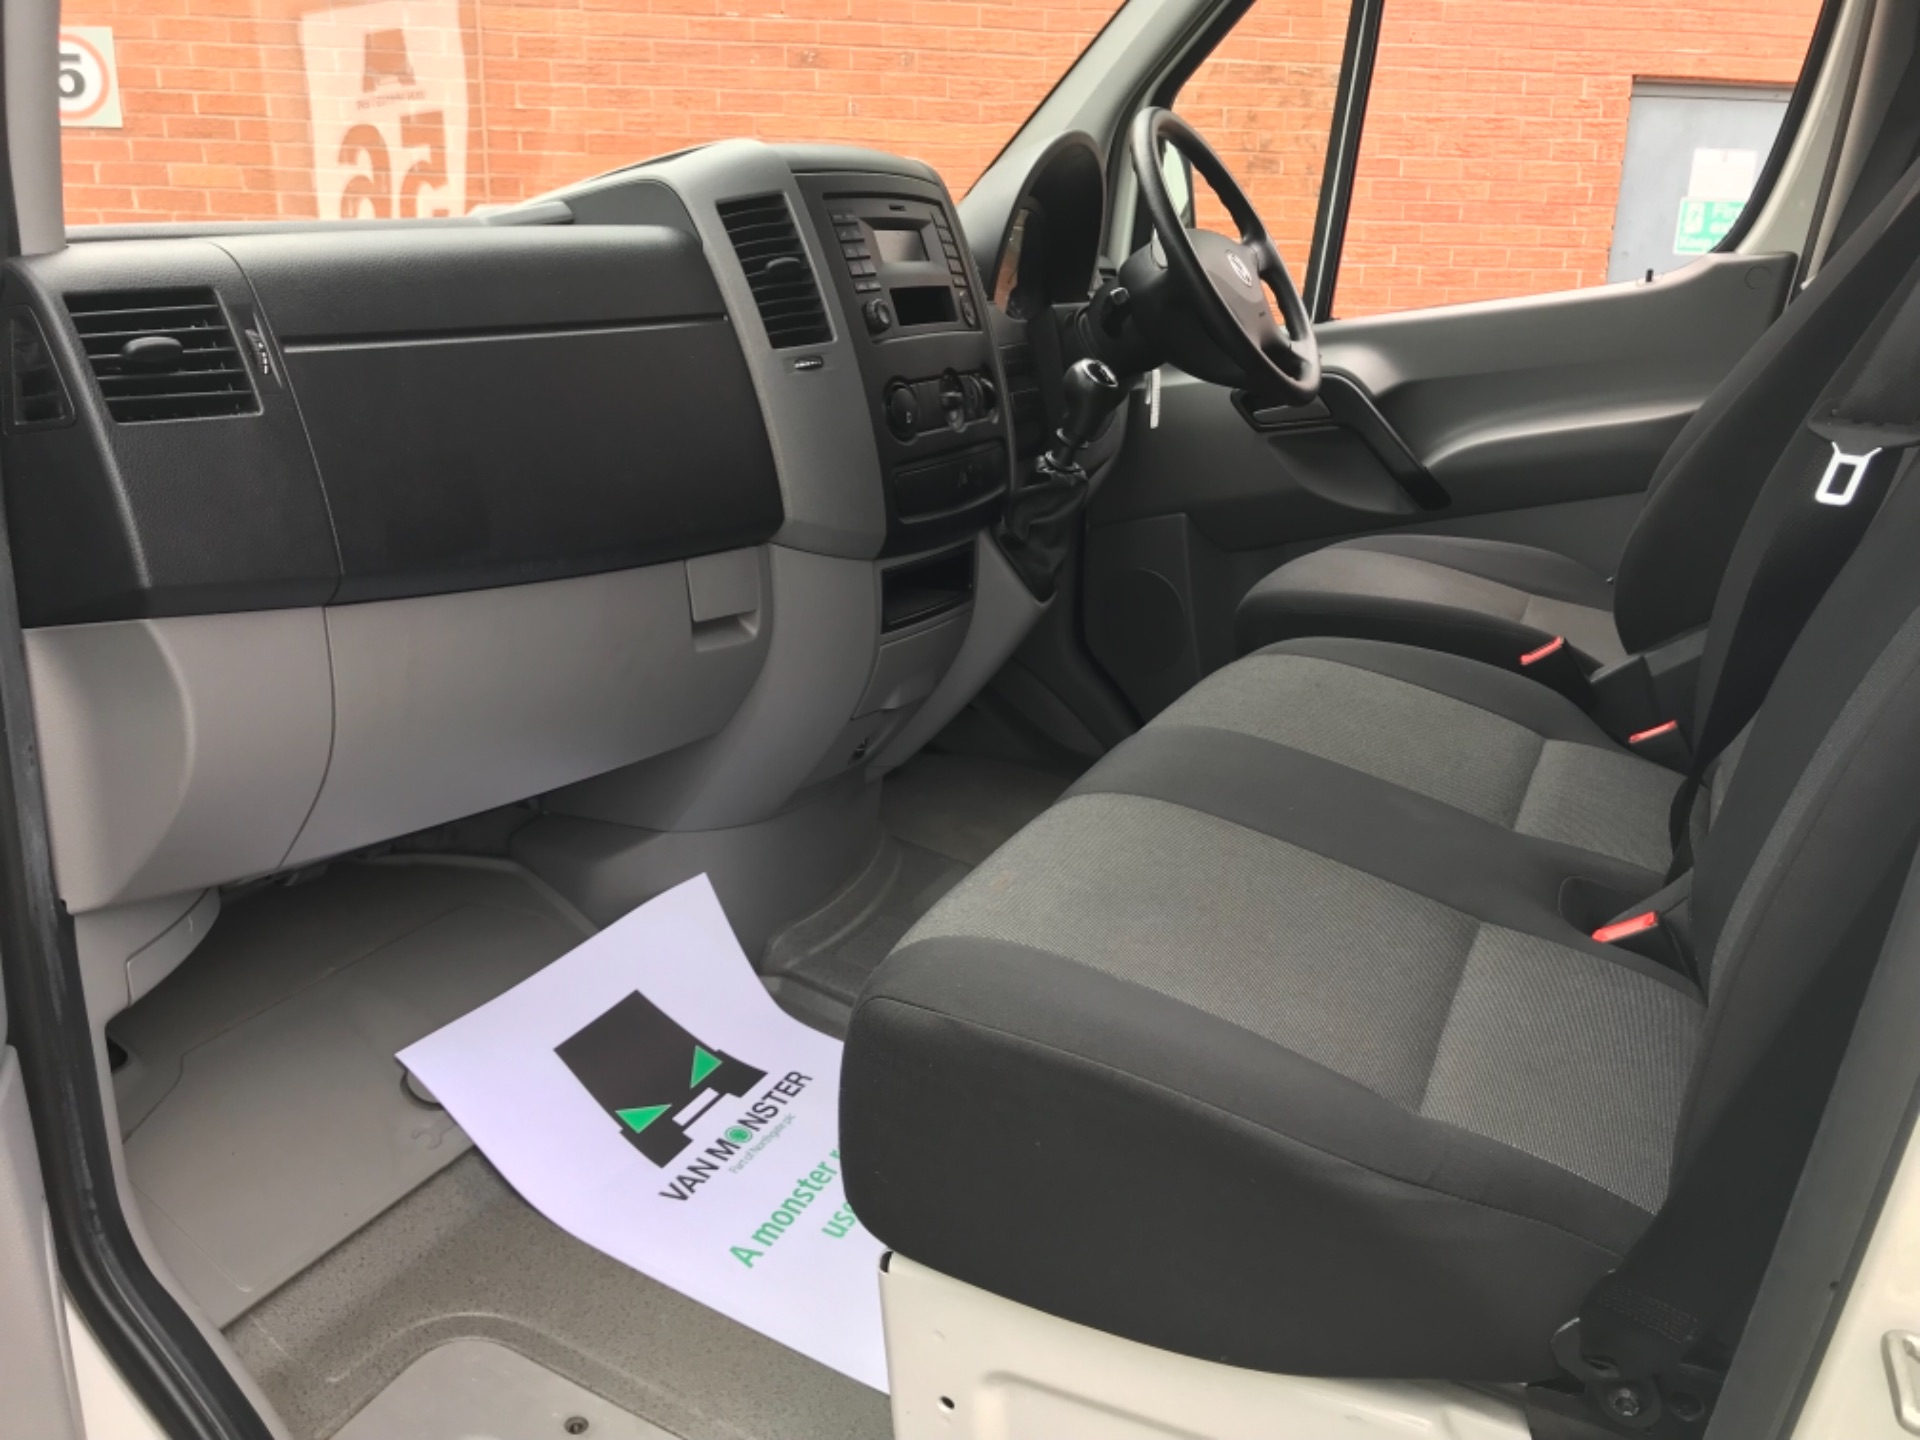 2016 Volkswagen Crafter  CR35 LWB 2.0 TDI 136PS HIGH ROOF EURO 5 (GK66HTU) Image 11